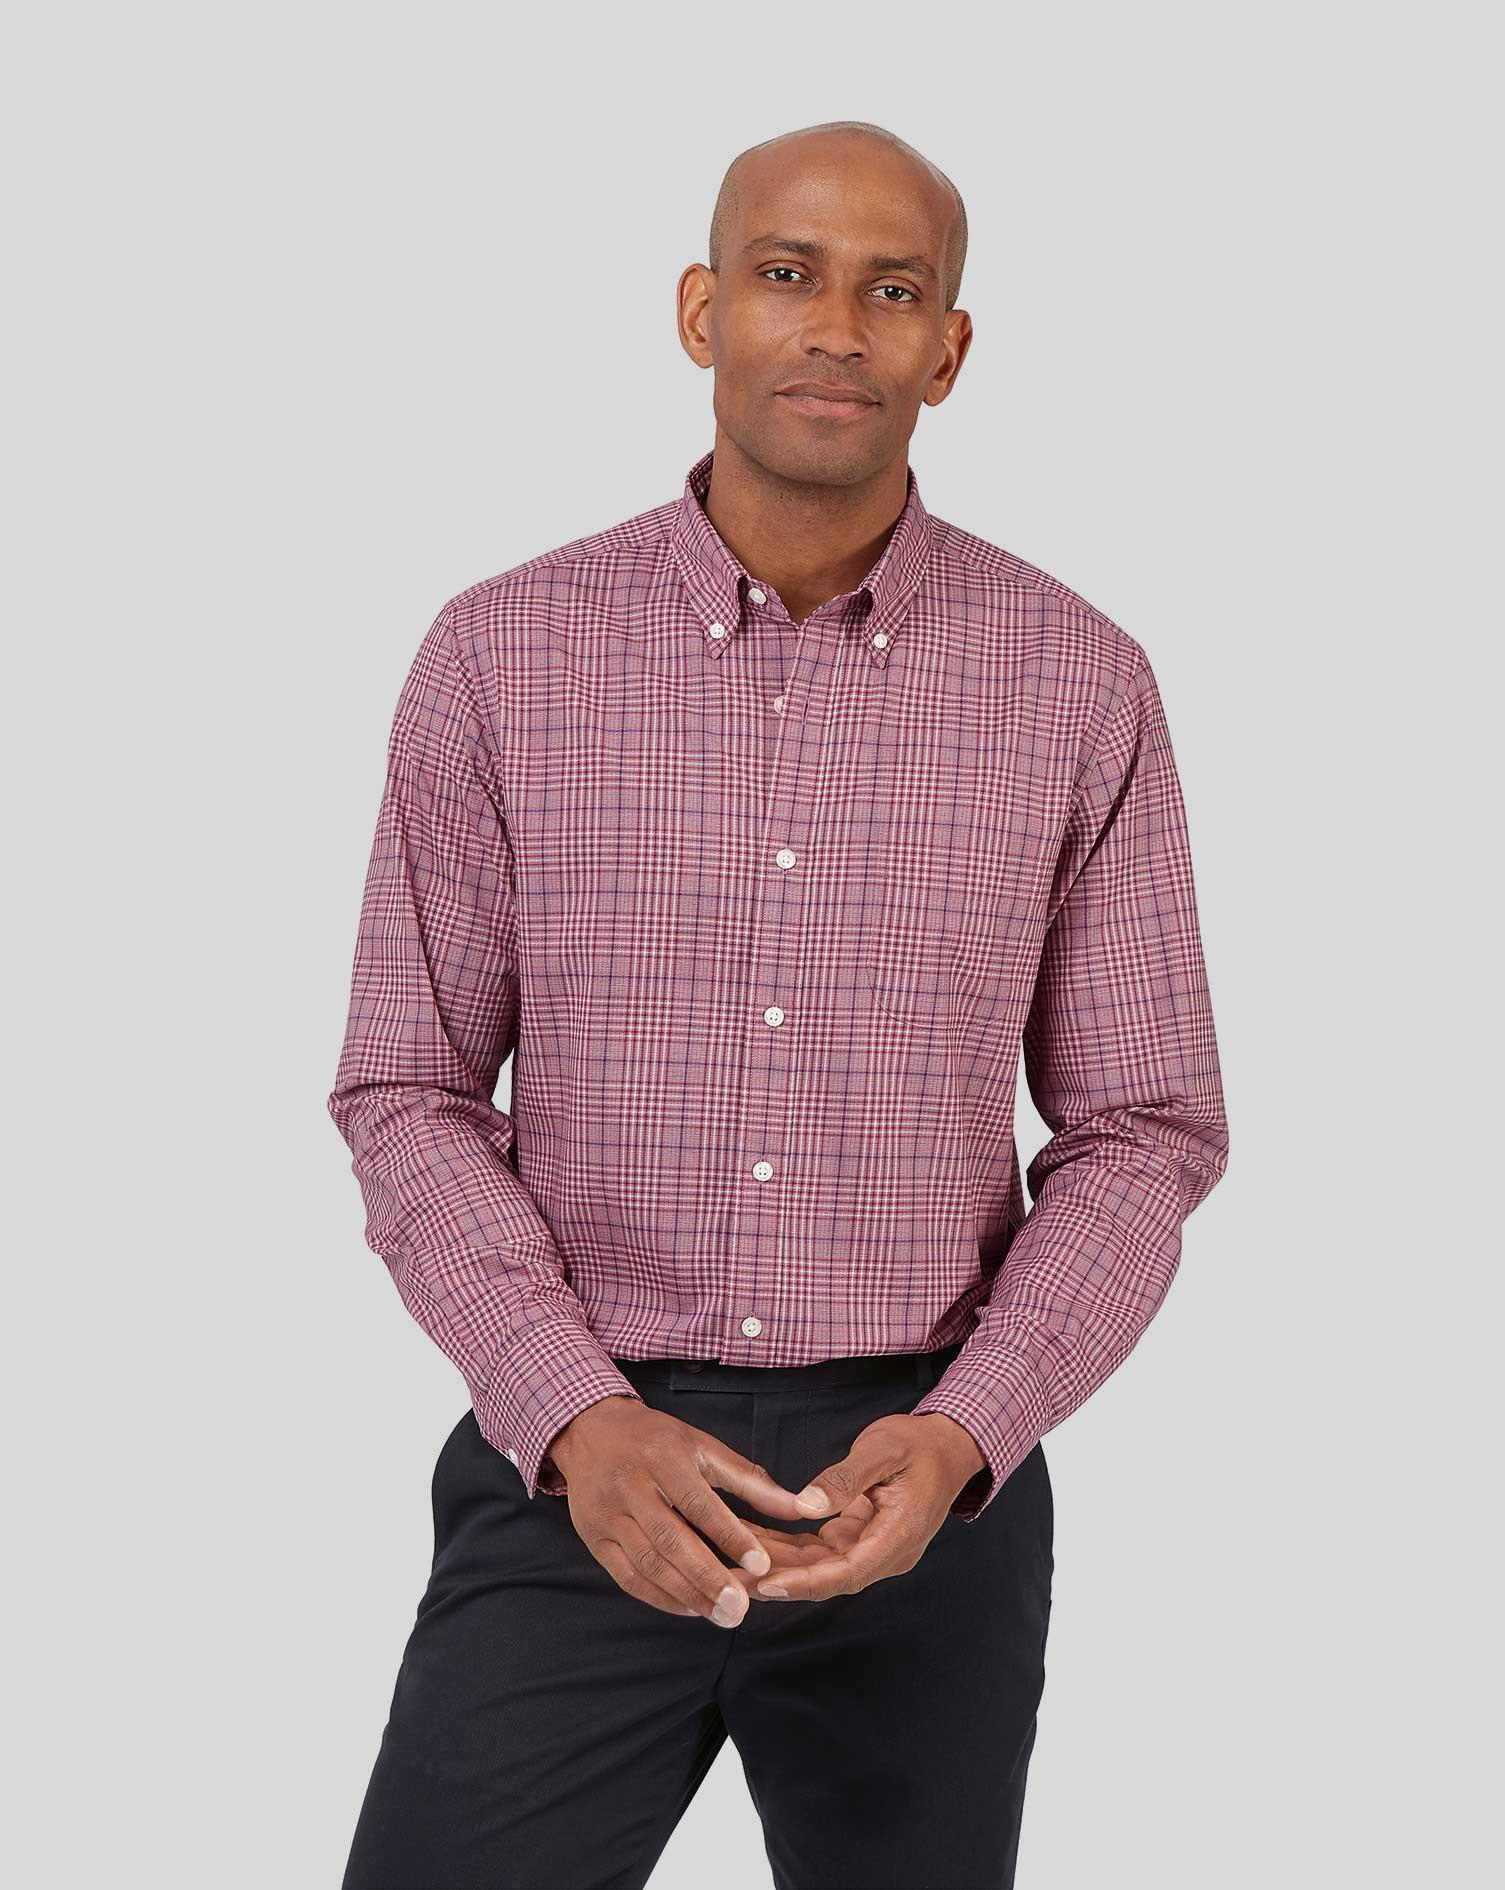 Image of Charles Tyrwhitt Button-Down Collar Non-Iron Stretch Poplin Large Check Cotton Shirt - Berry Single Cuff Size Medium by Charles Tyrwhitt